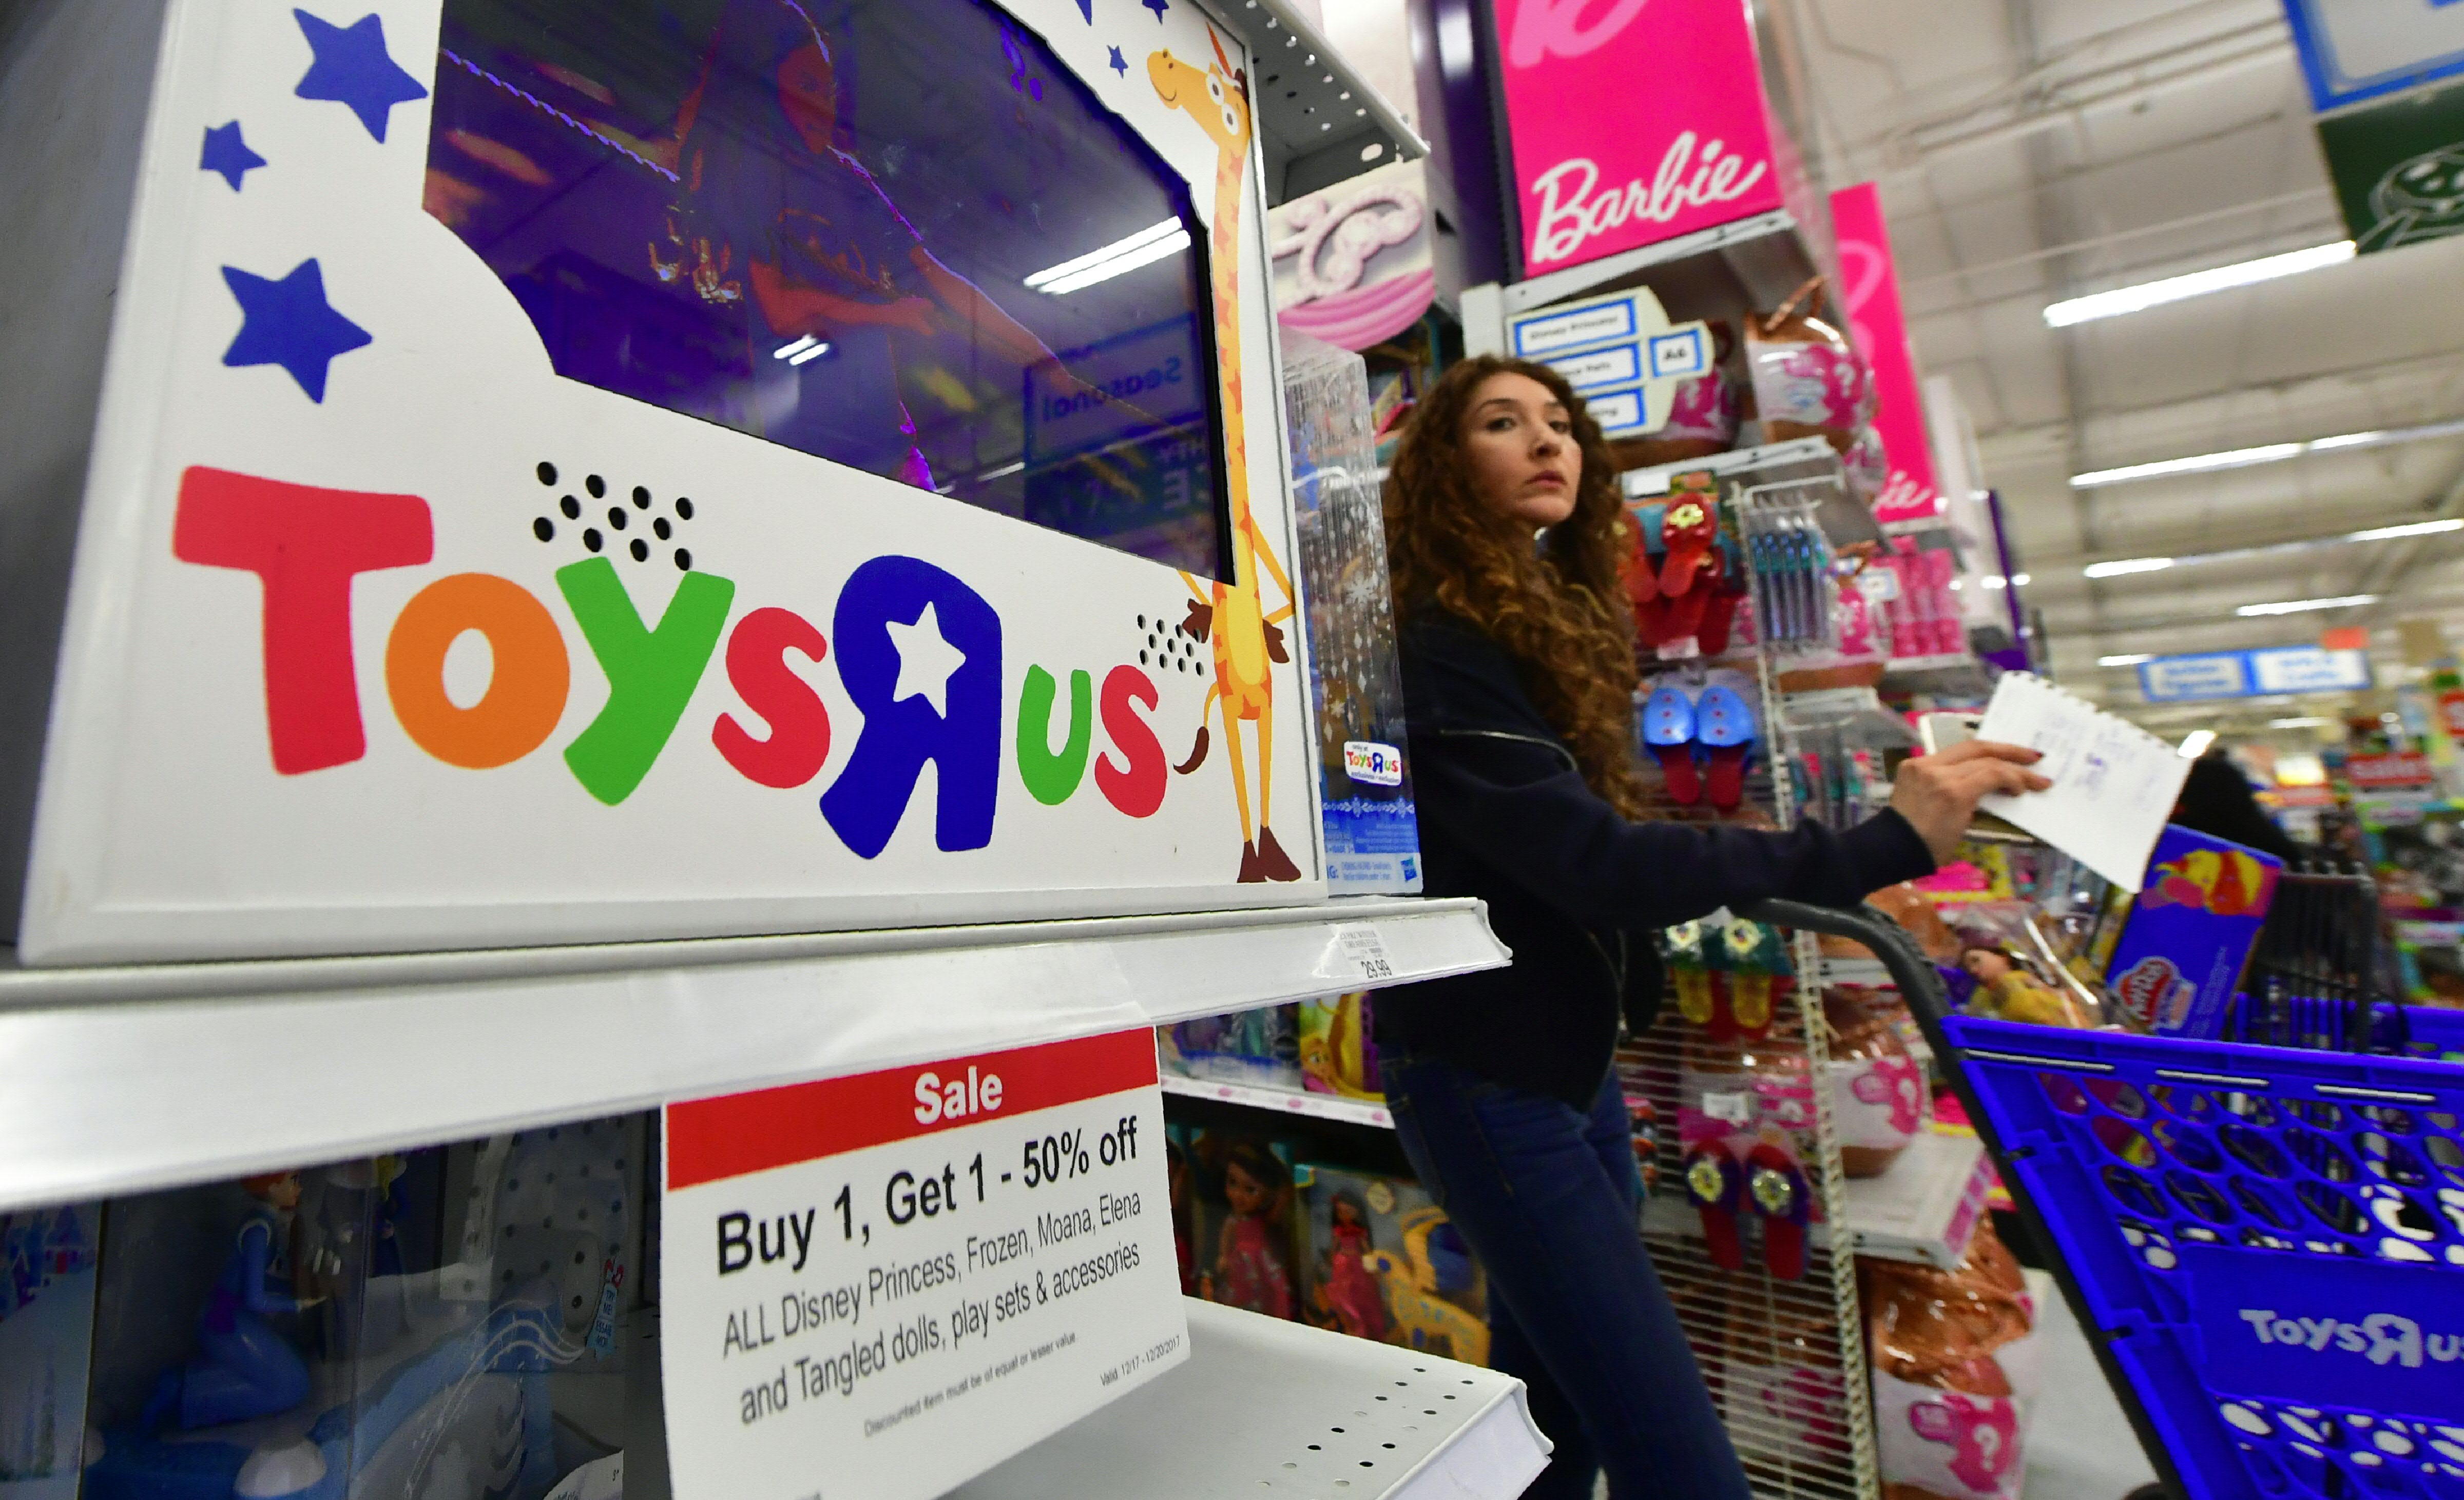 US-BUSINESS-TOYSRUS